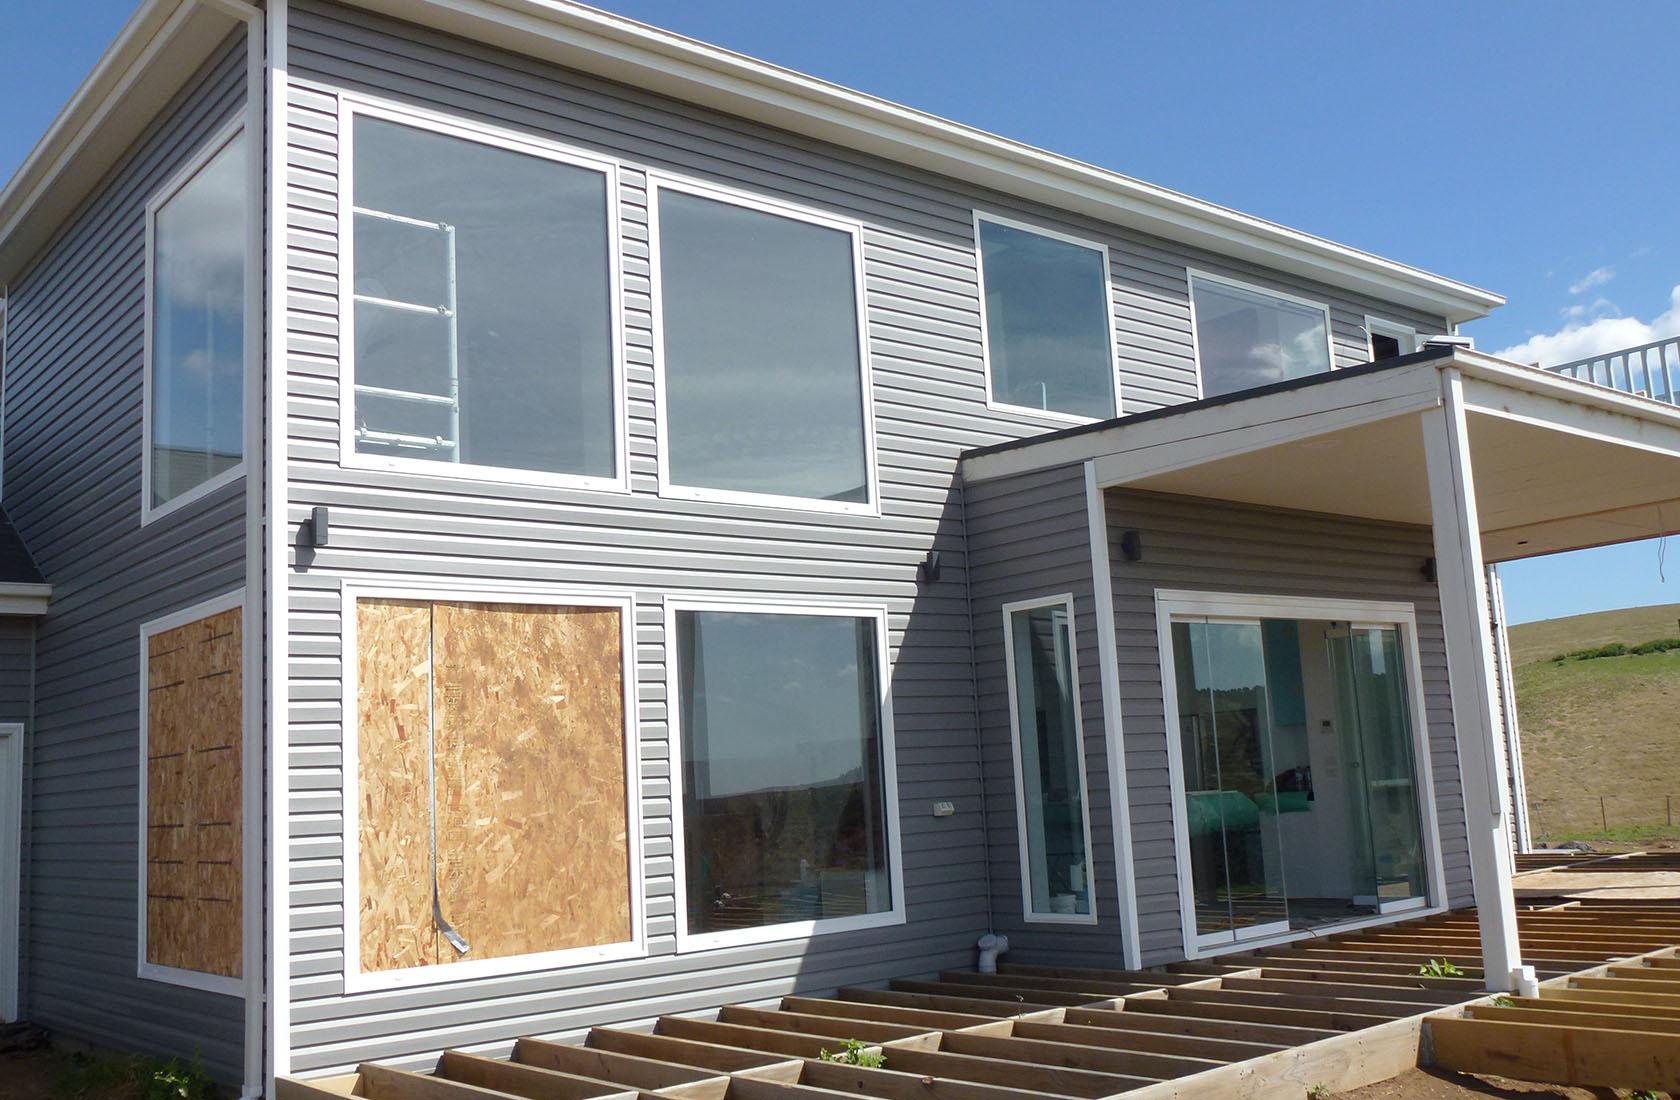 Pentland Hills Counrty Home Cladding Installation Vinyl